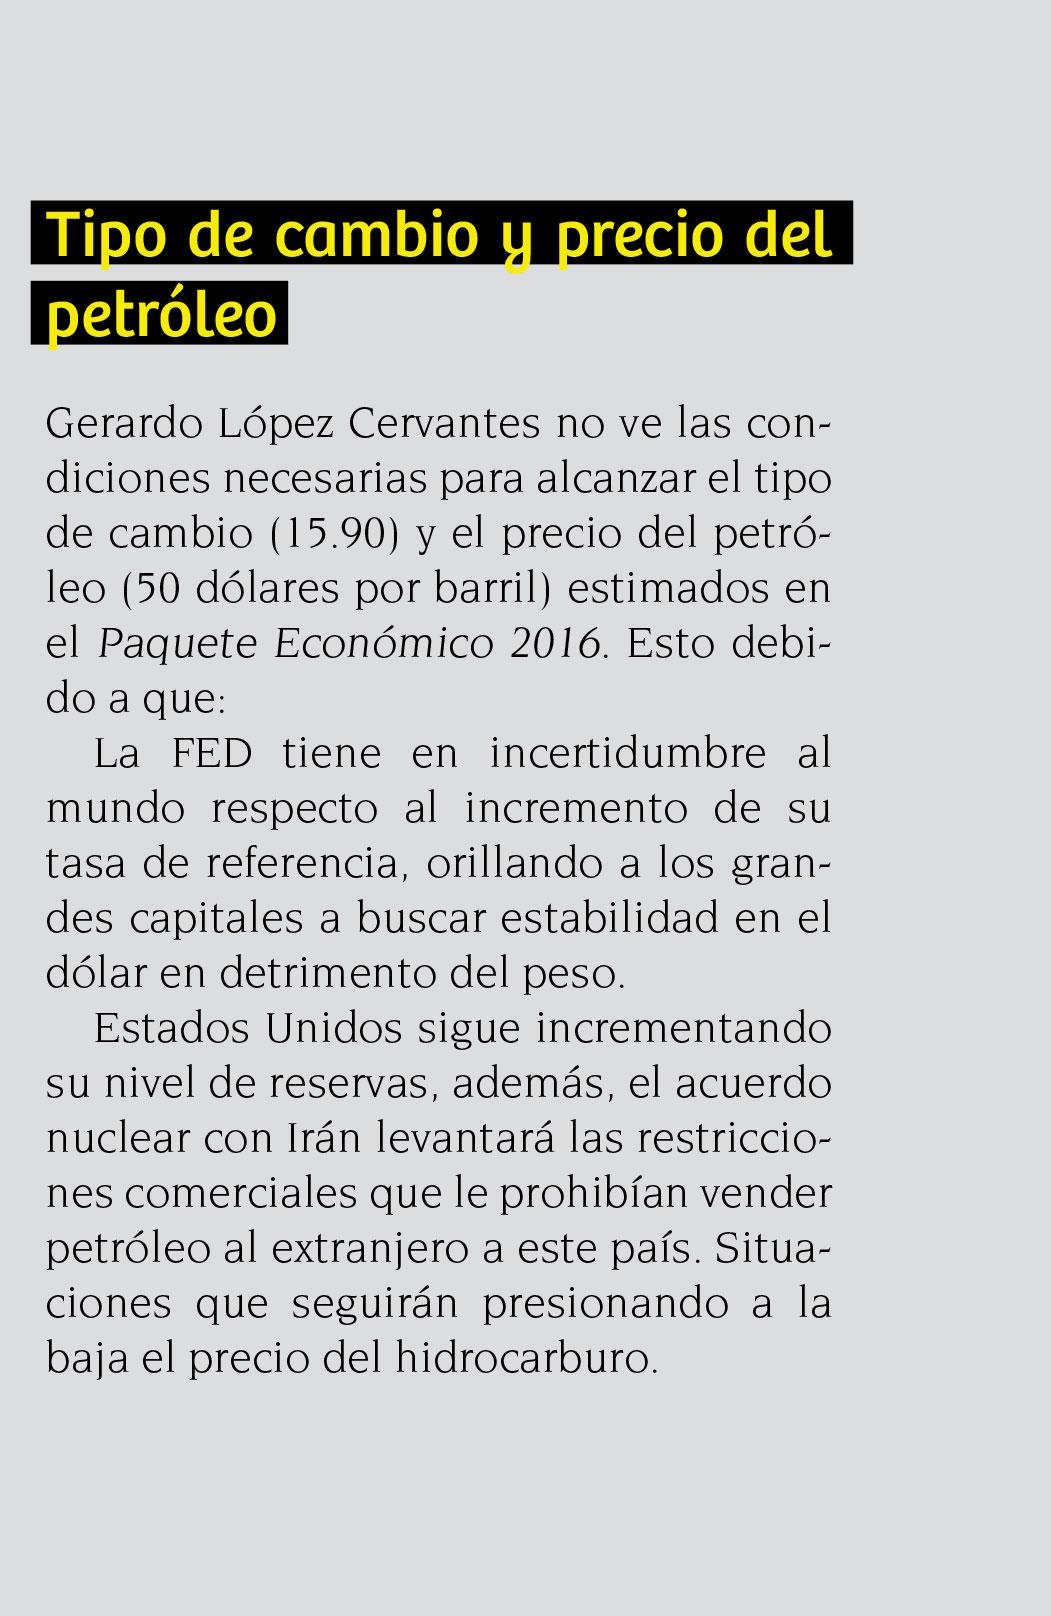 sinaloa_dolarizado-peso_petroleo